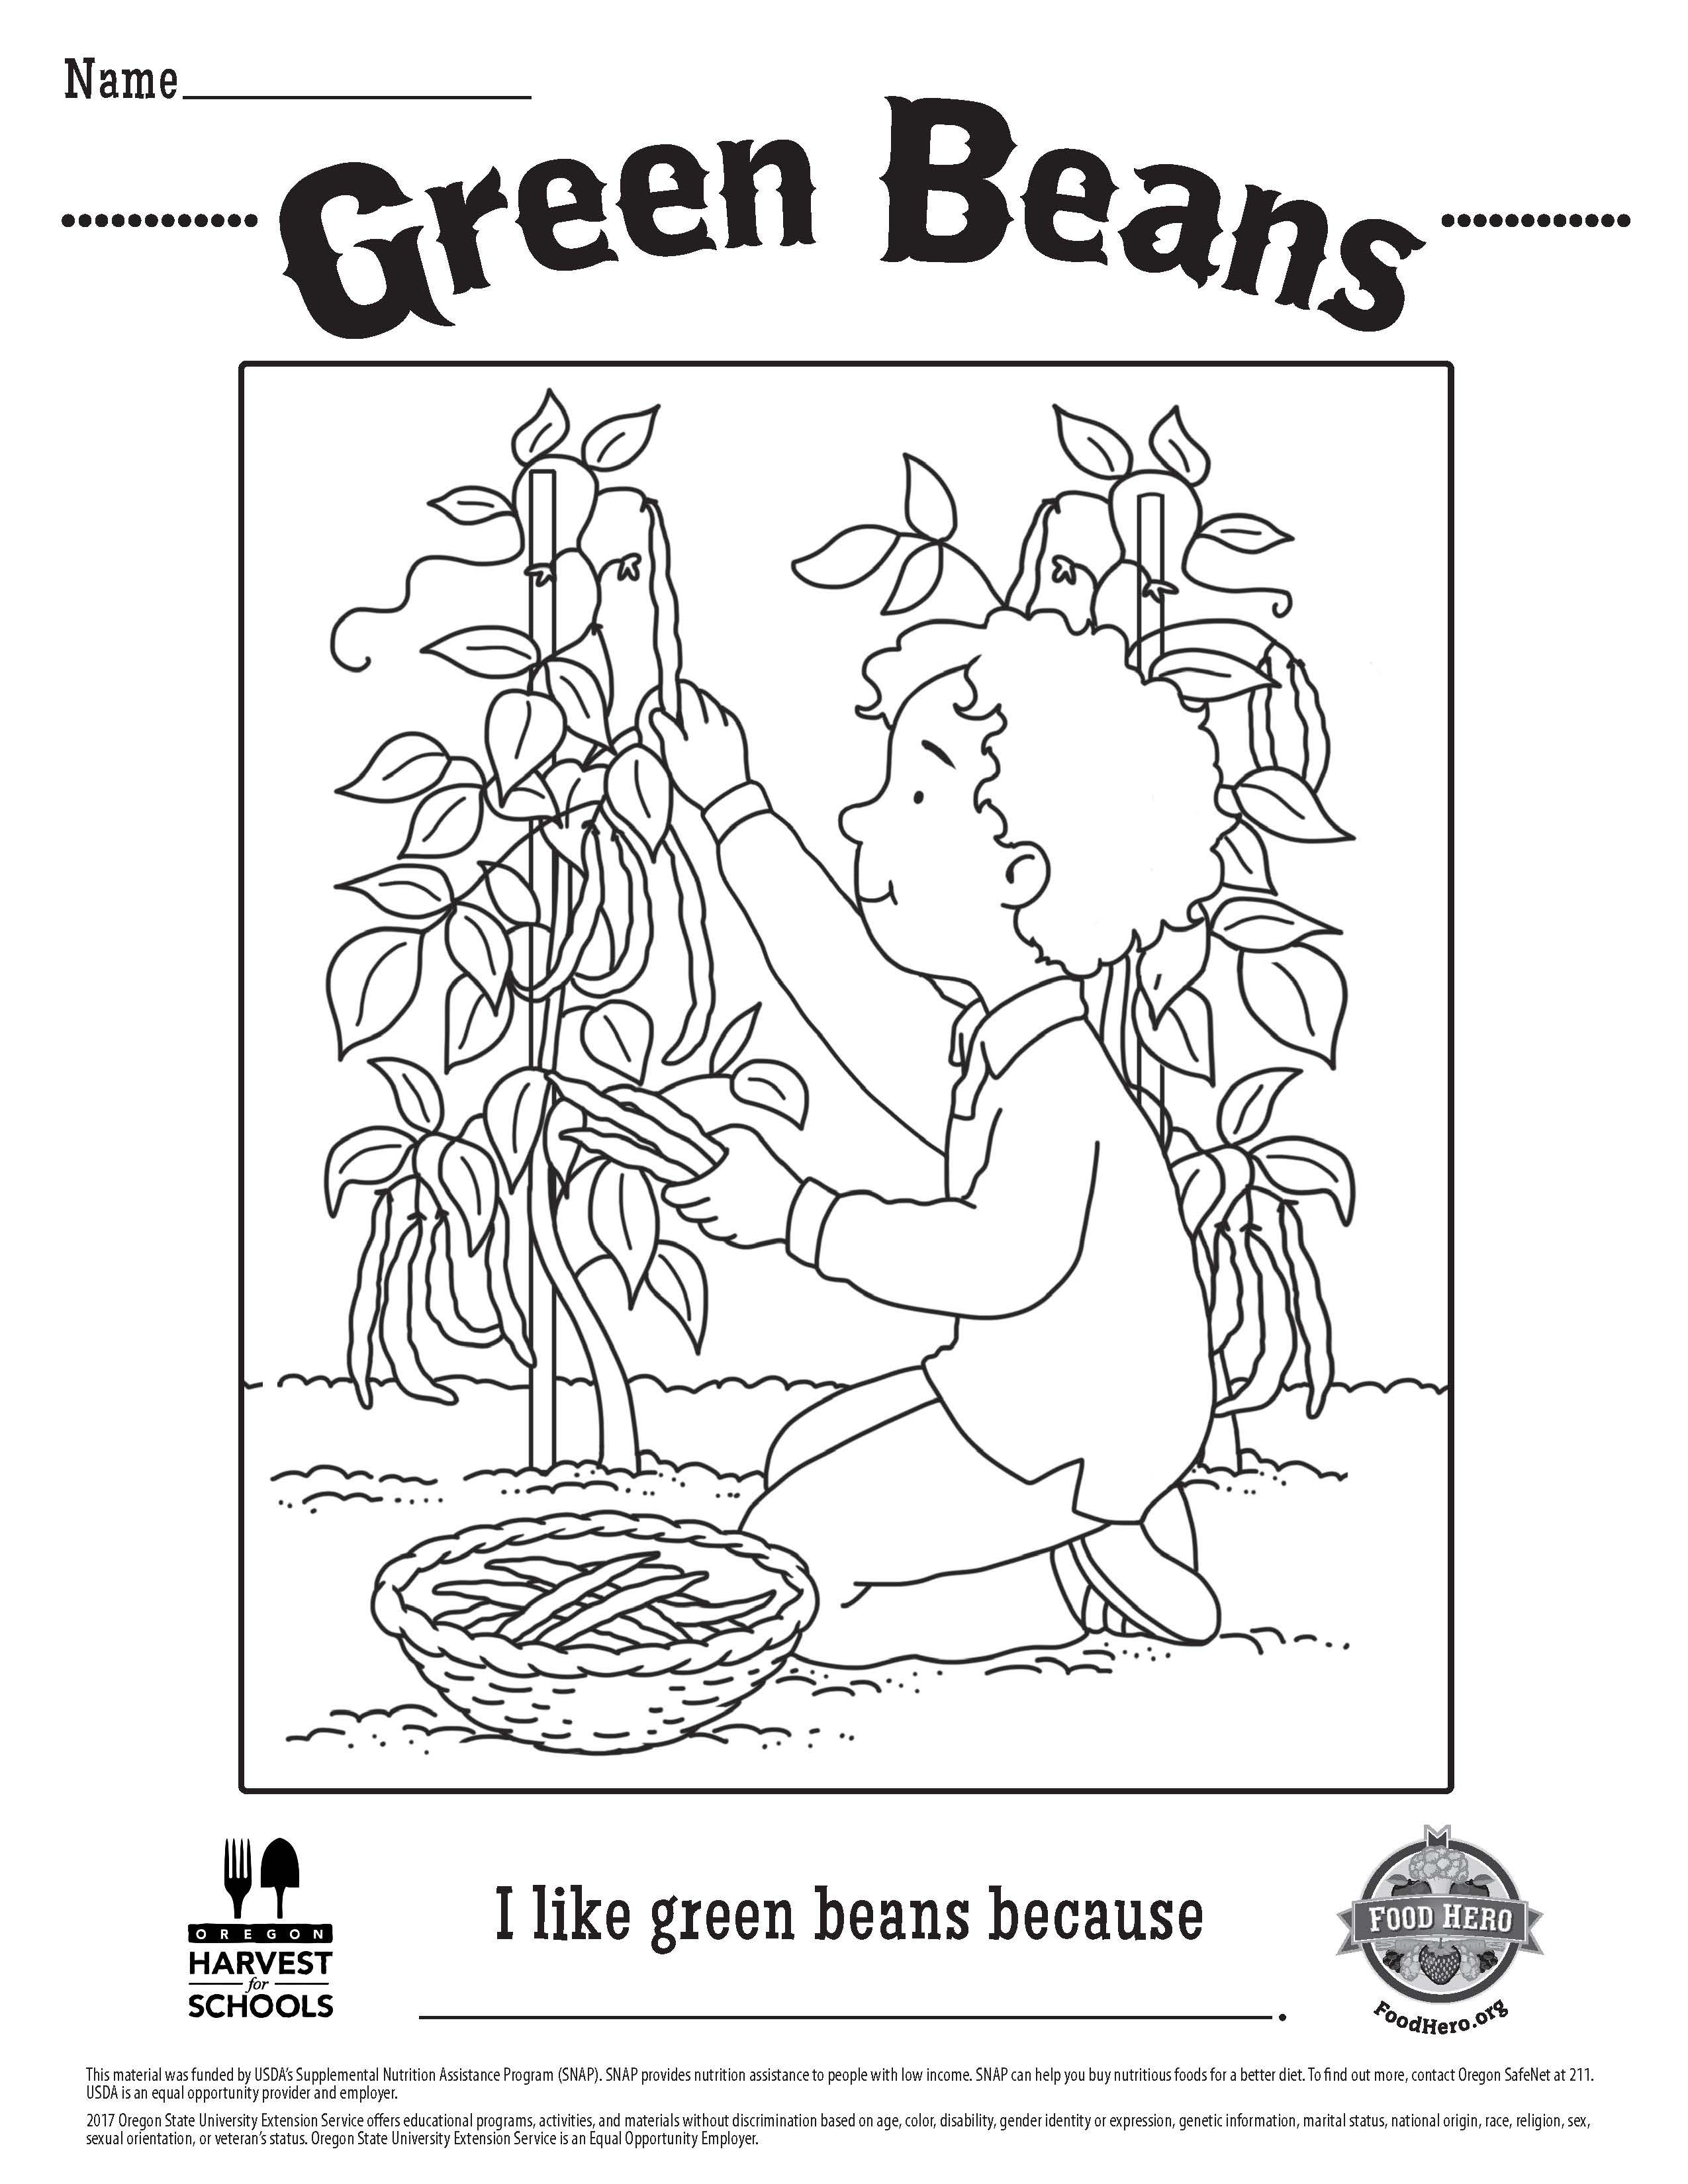 Children S Free Printable Food Hero Green Beans Coloring